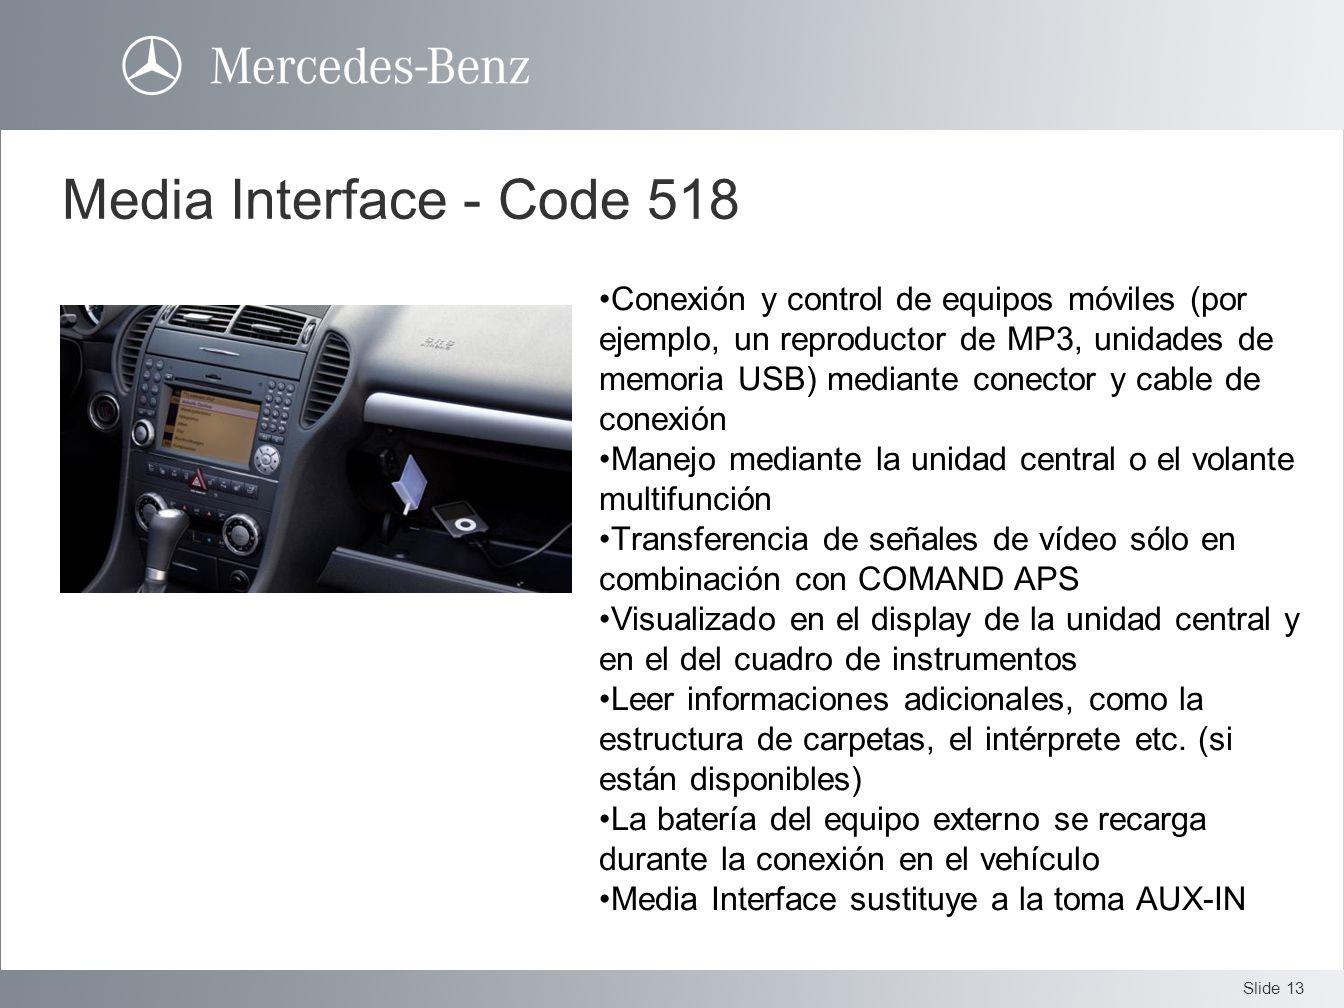 Media Interface - Code 518